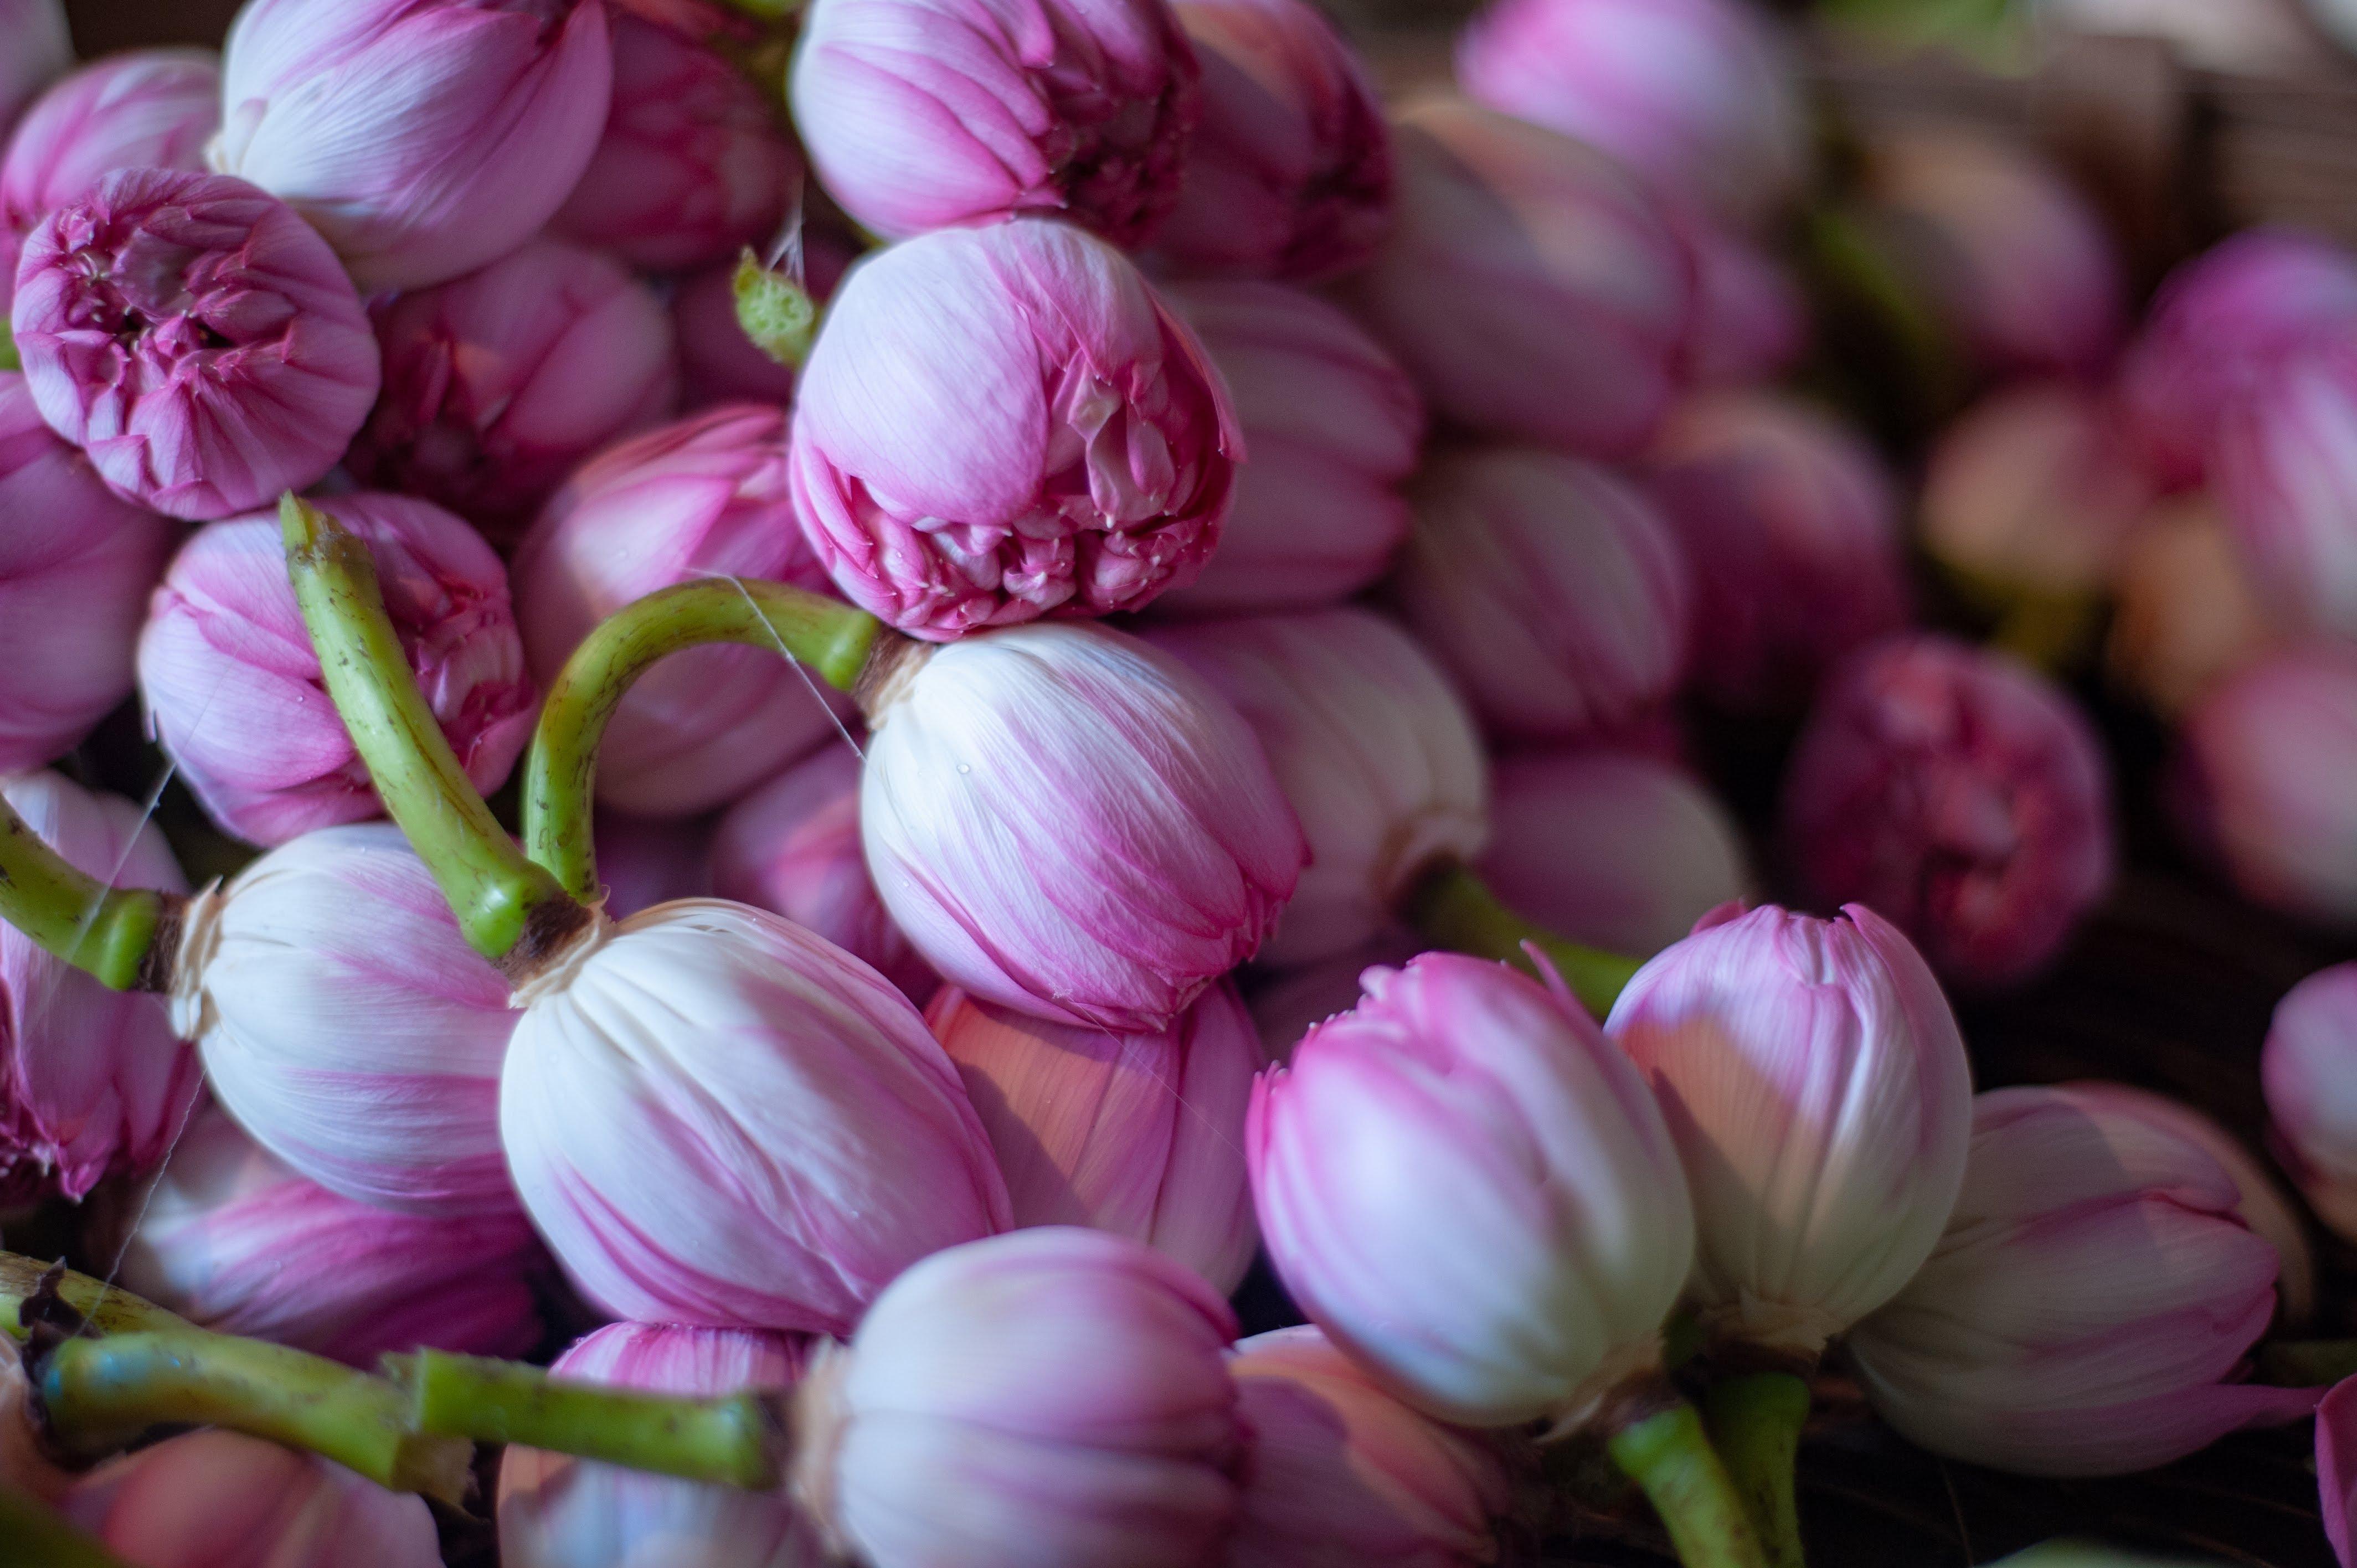 A close up shot of beautiful pink tulip buds.